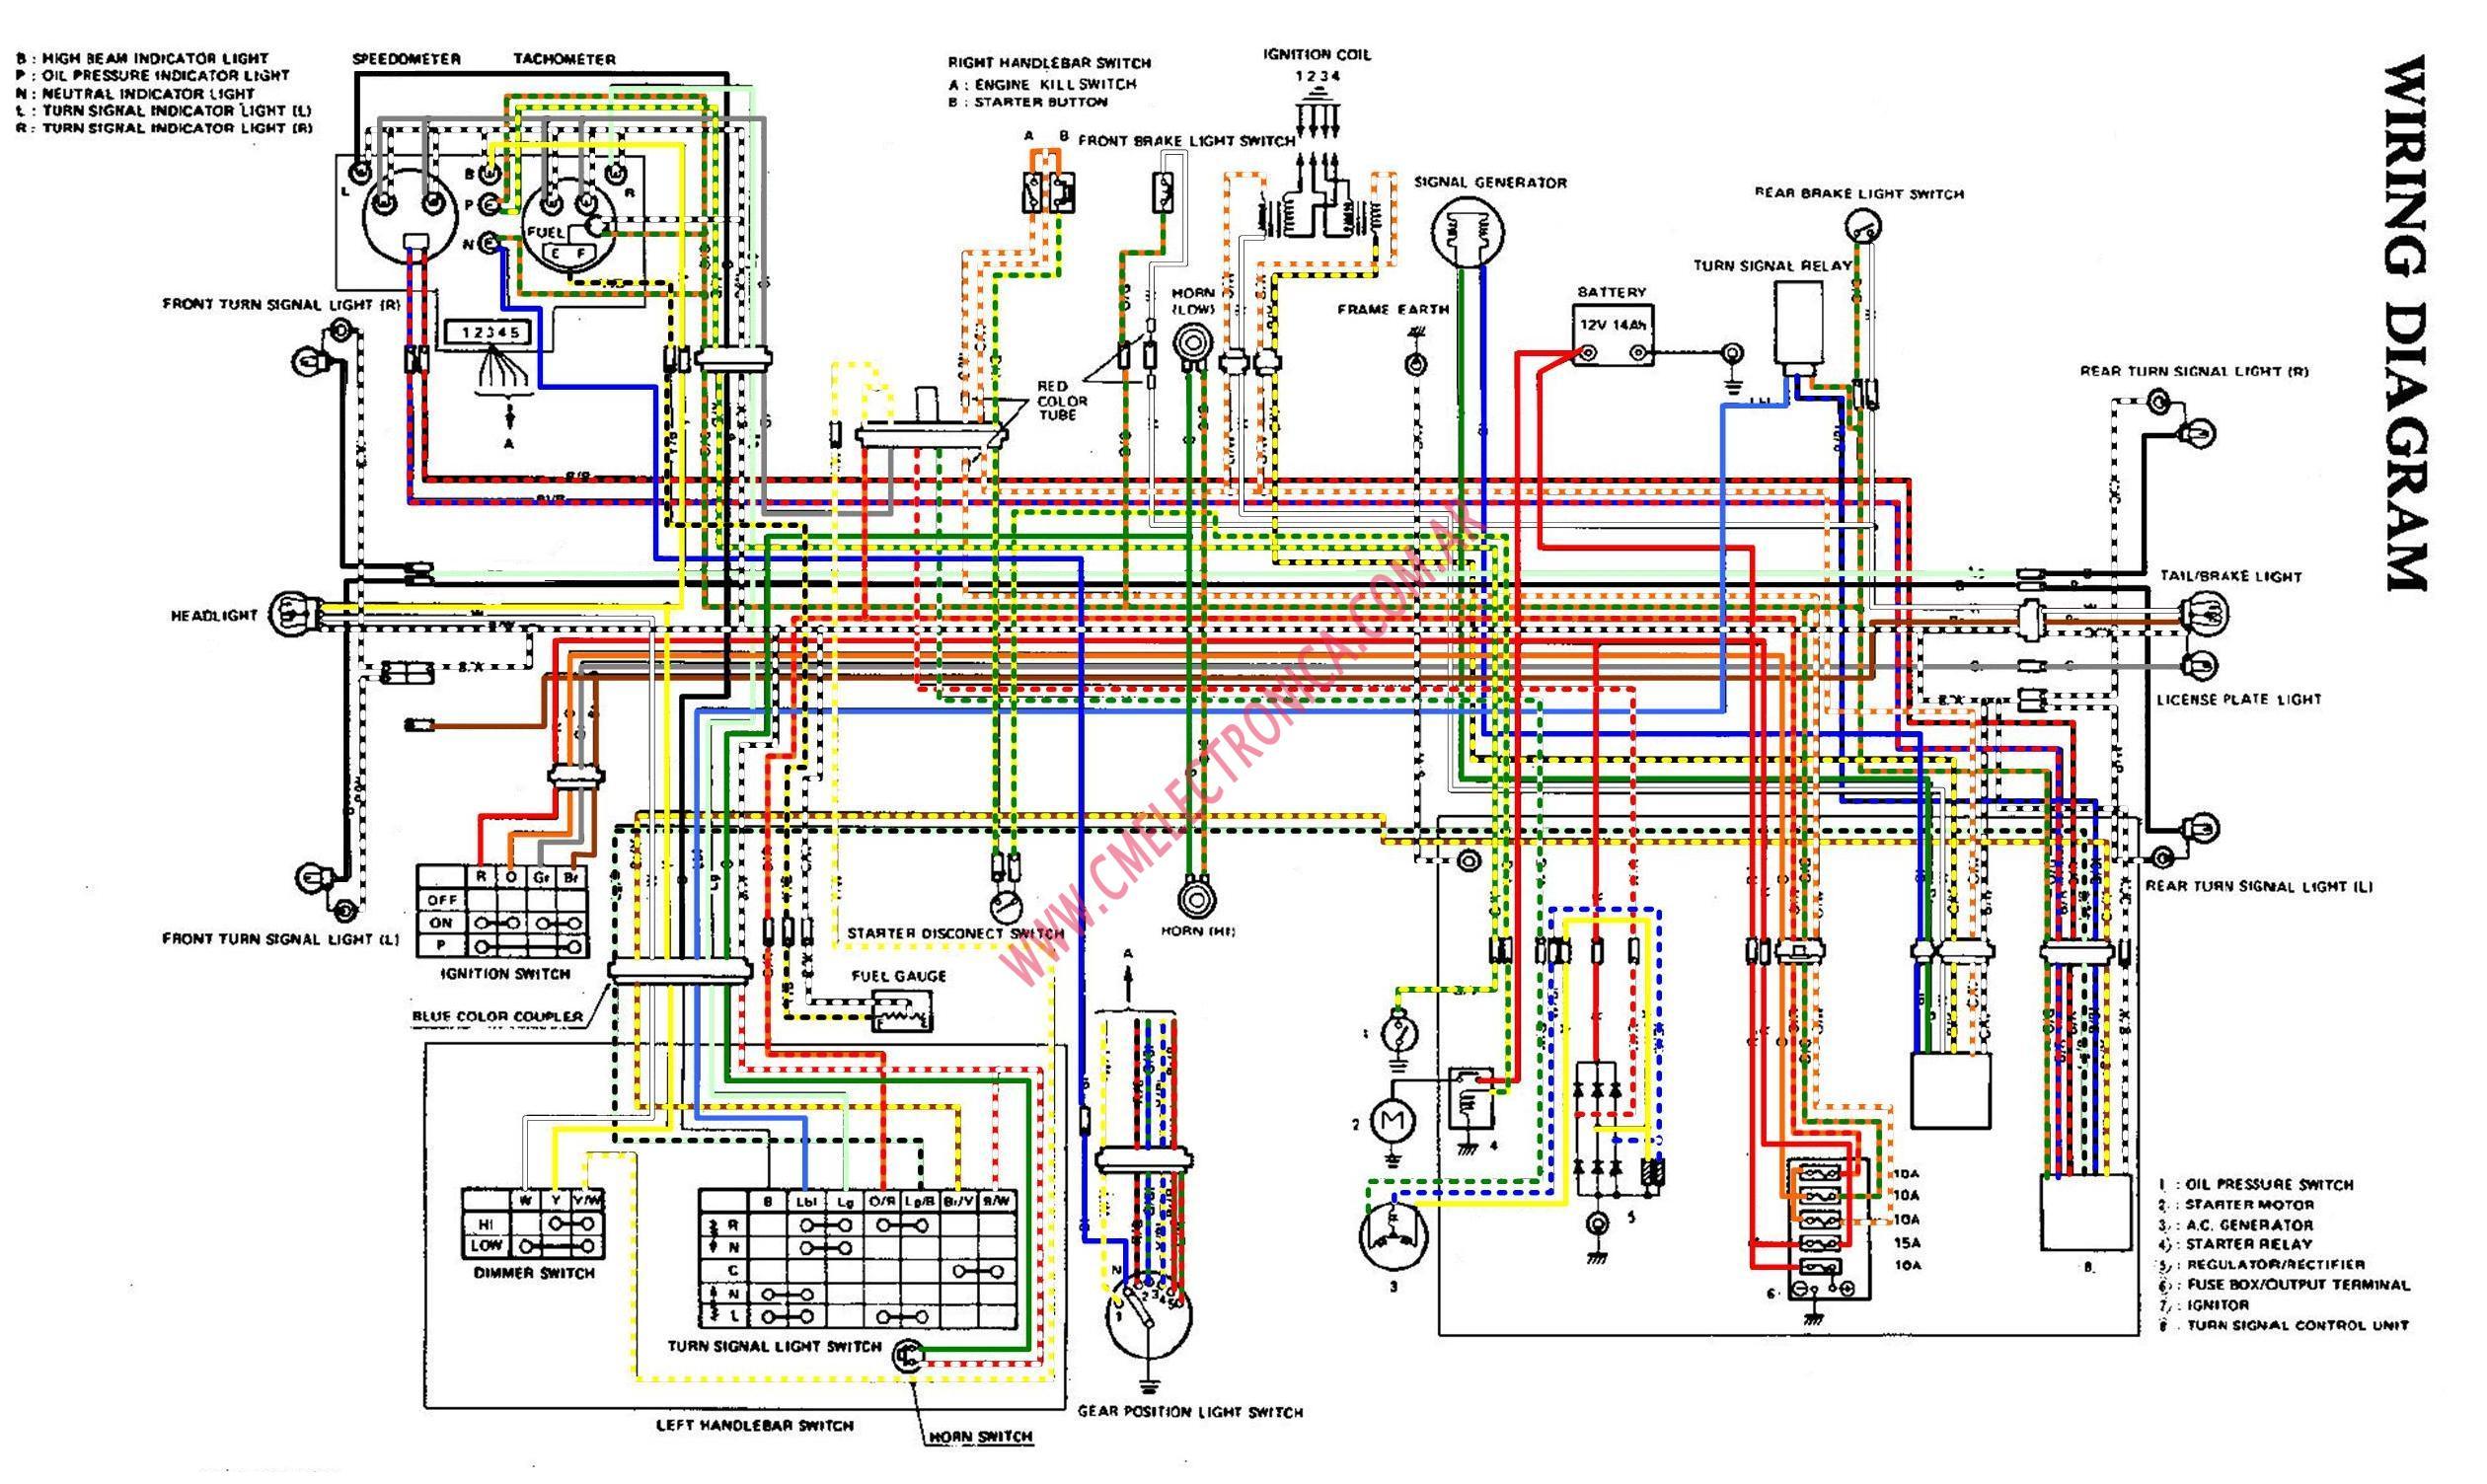 kr_5491] 1982 suzuki 1100 wiring diagram as well 1980 suzuki wiring diagram  free diagram  xortanet rious vesi perm scoba mohammedshrine librar wiring 101